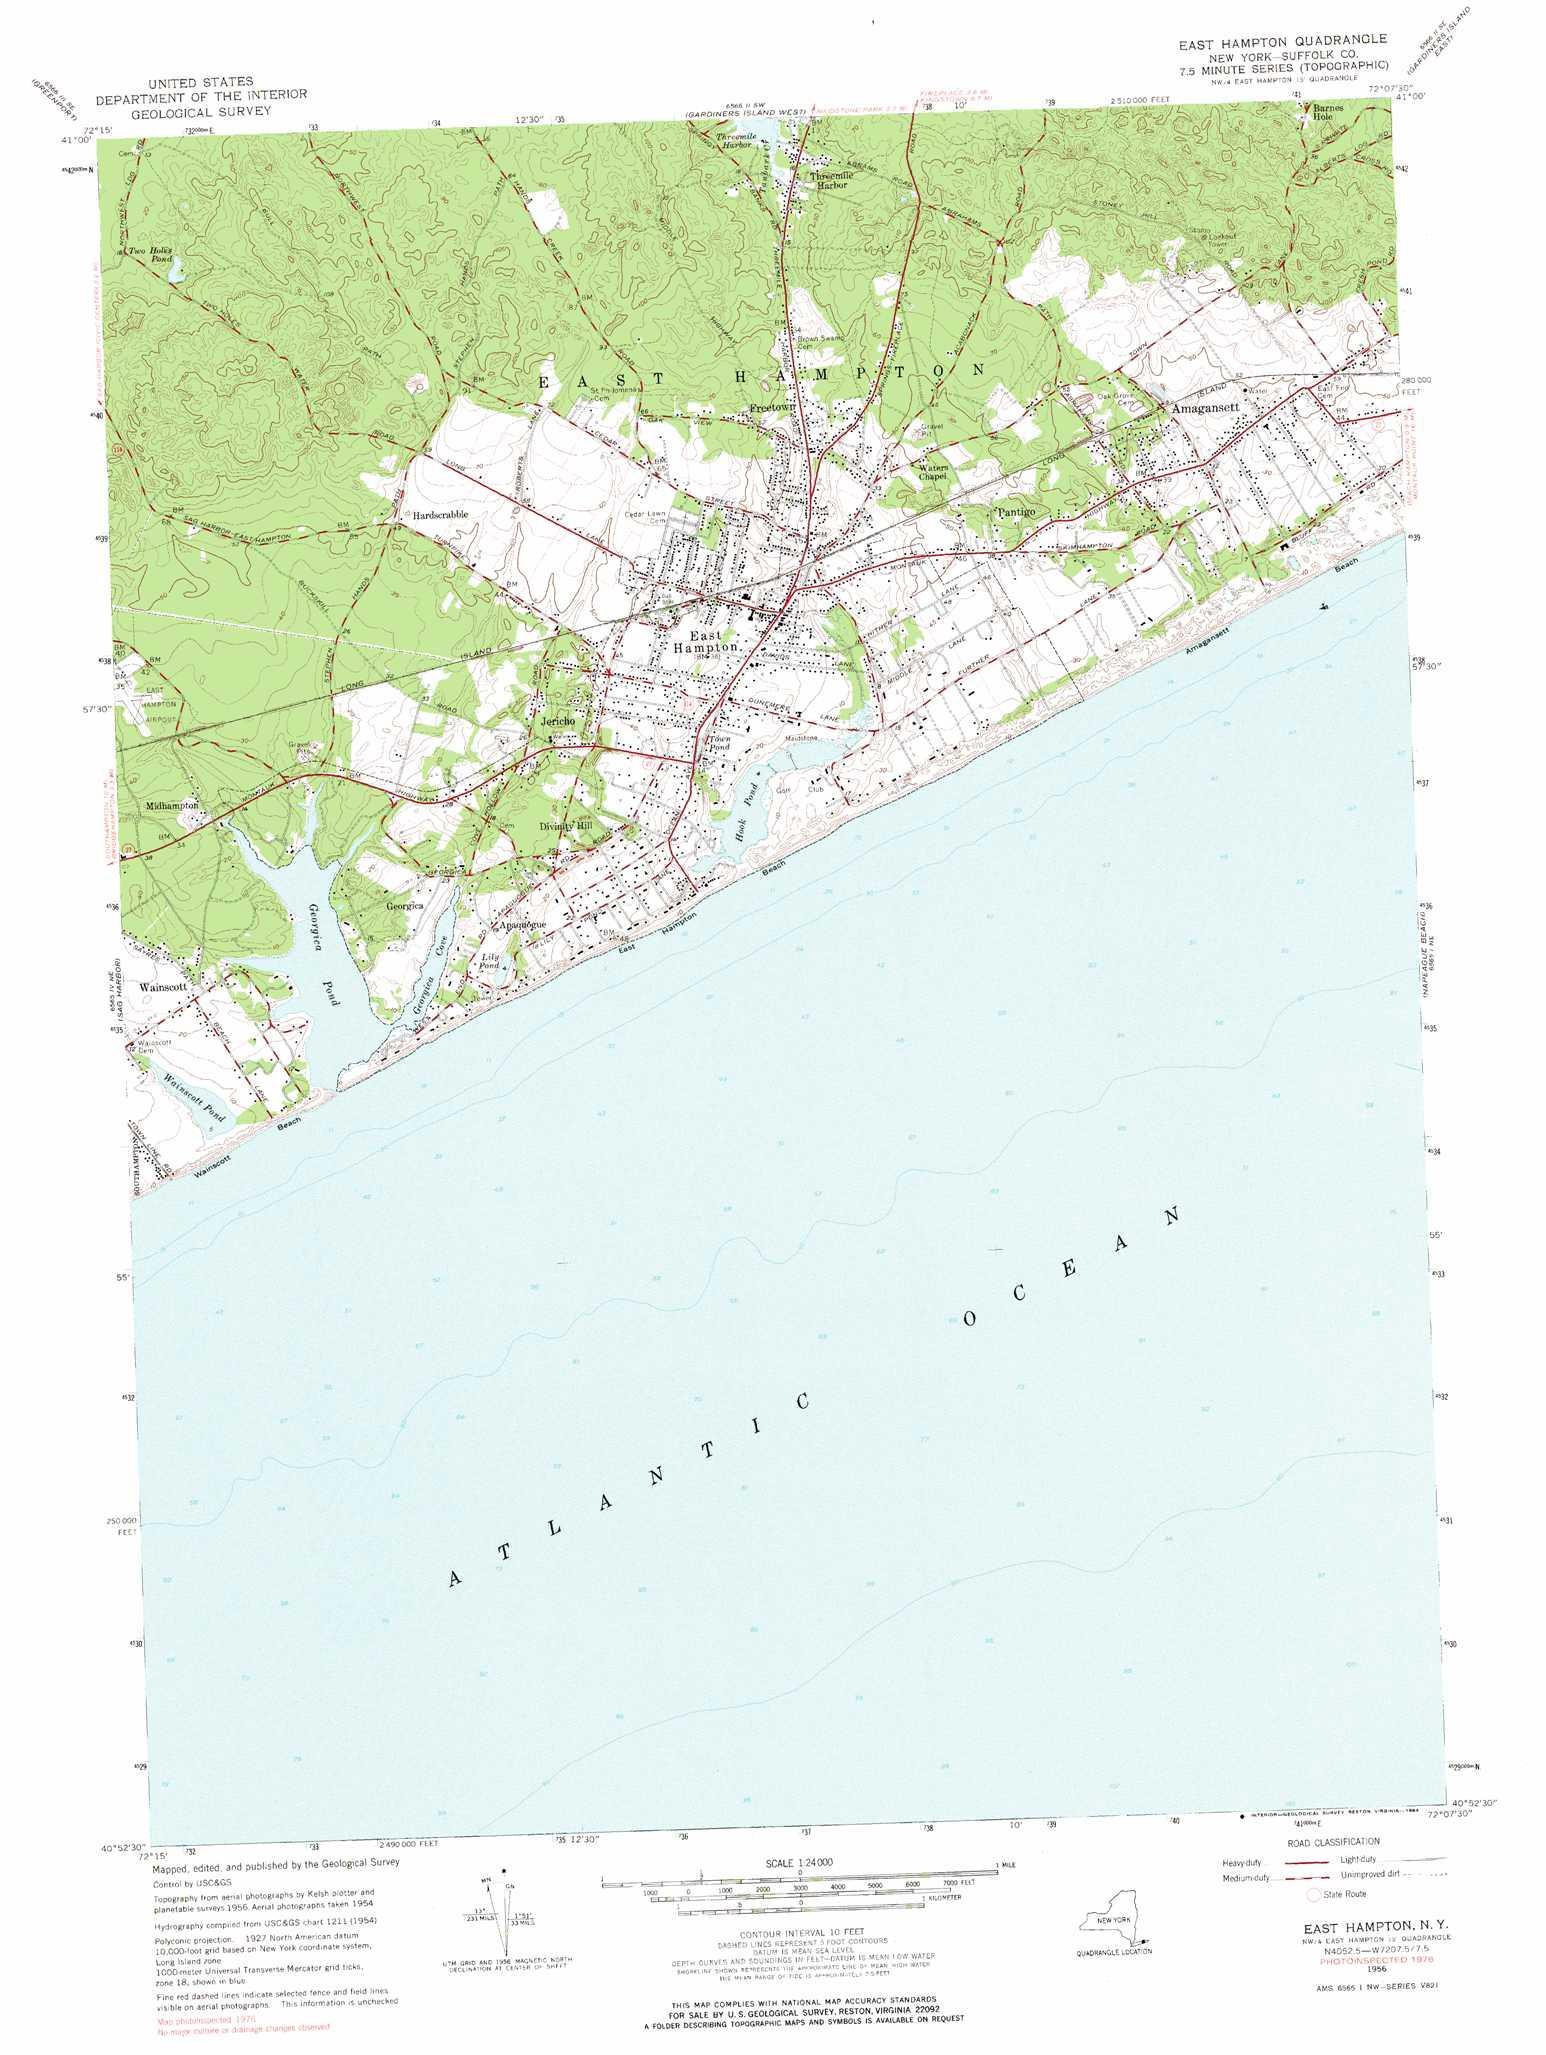 East Hampton Topographic Map Ny Usgs Topo Quad 40072h2